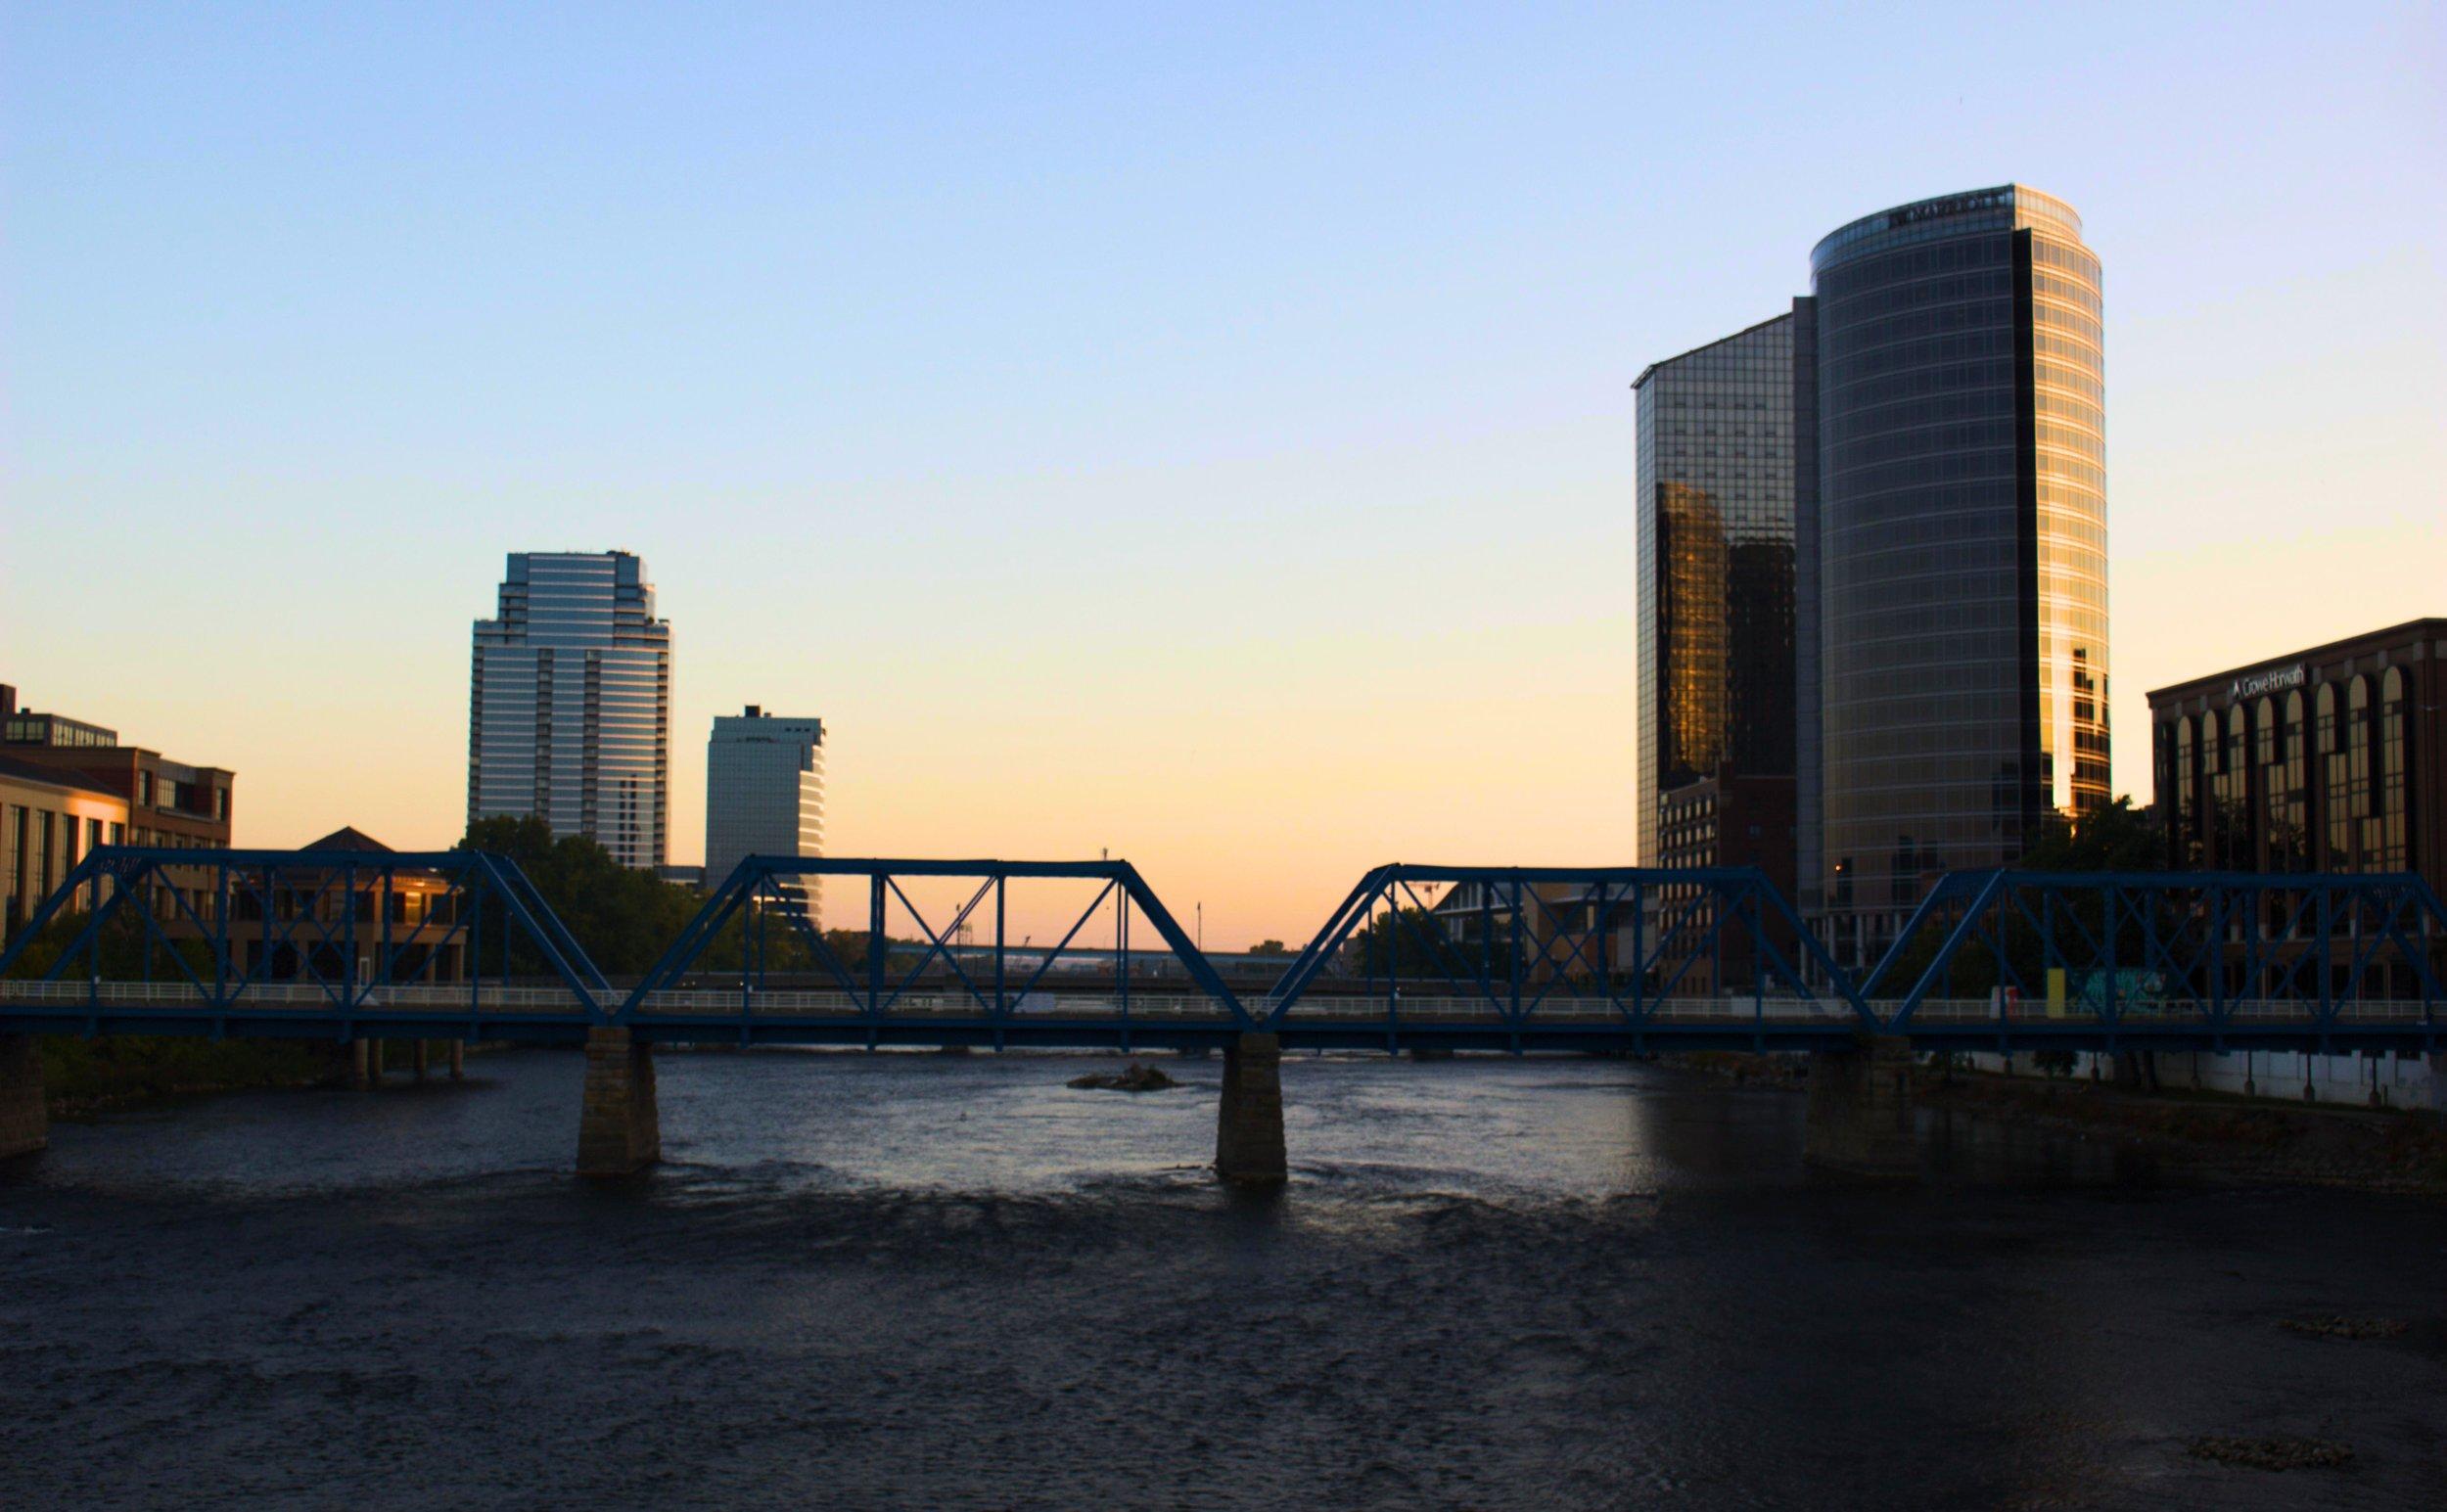 From the Fulton Street bridge